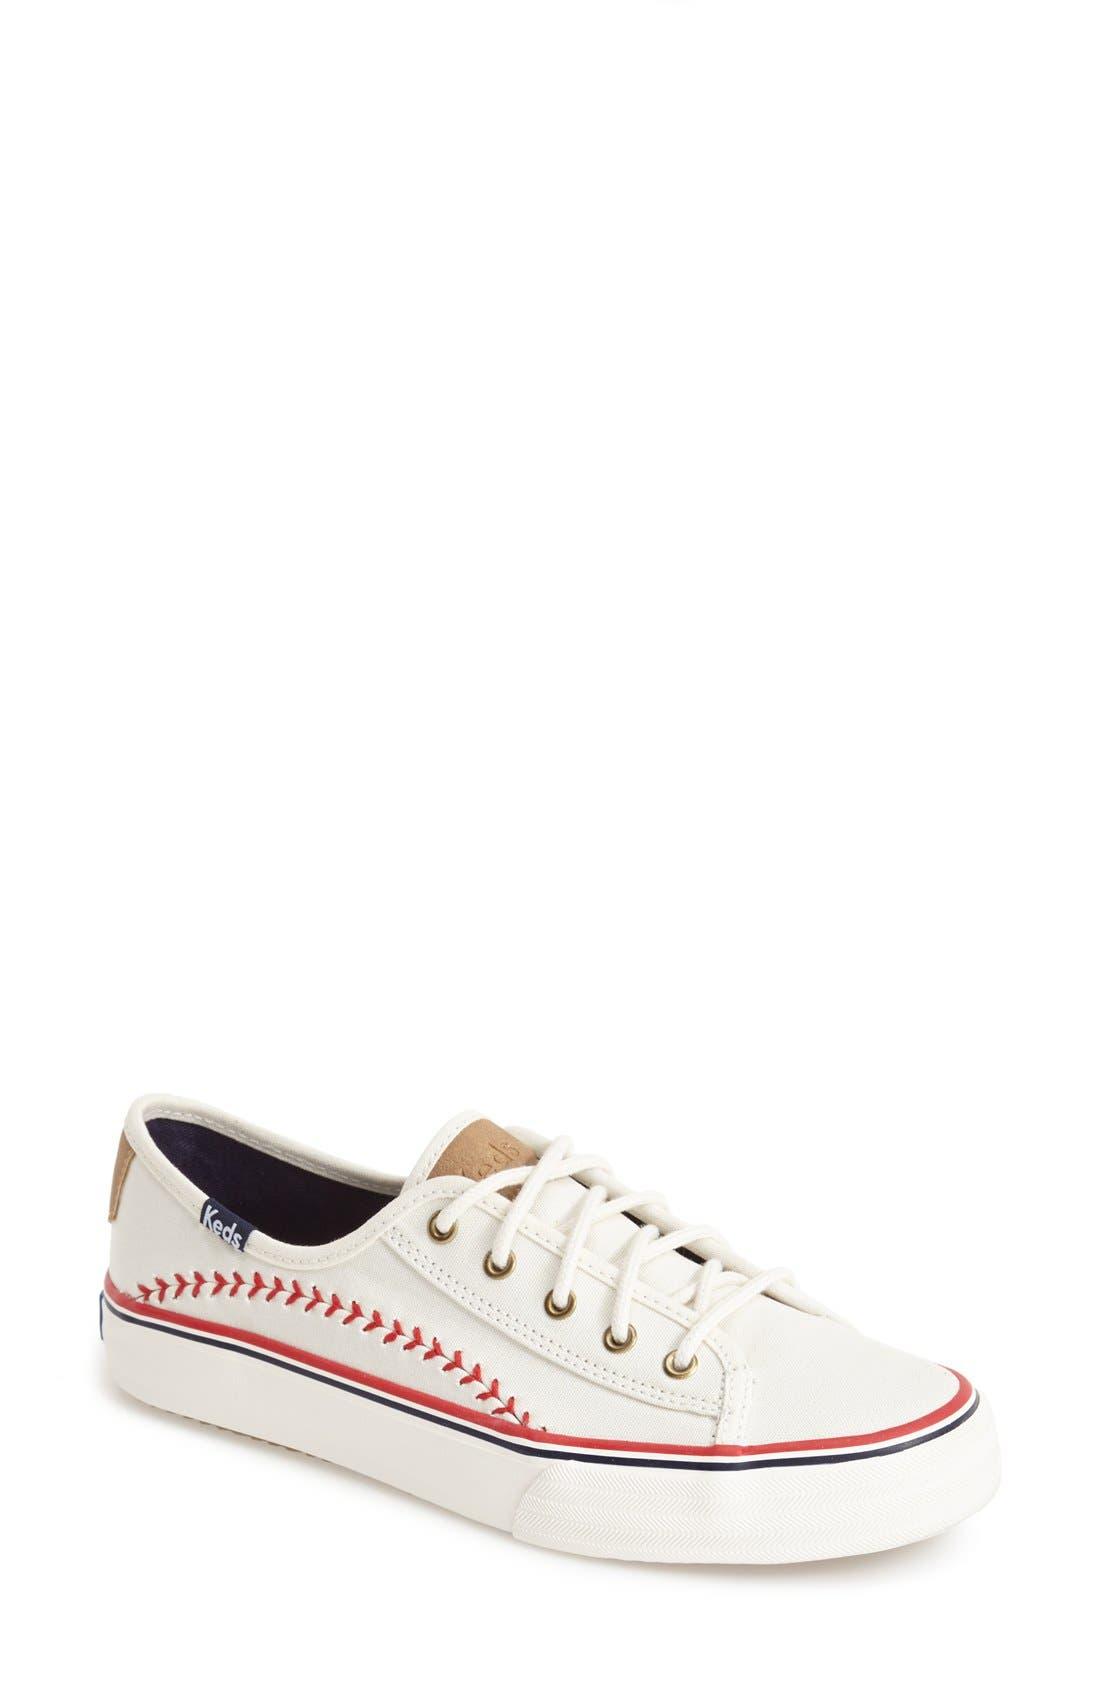 Alternate Image 1 Selected - Keds® 'Champion - Double Take' Sneaker (Women)